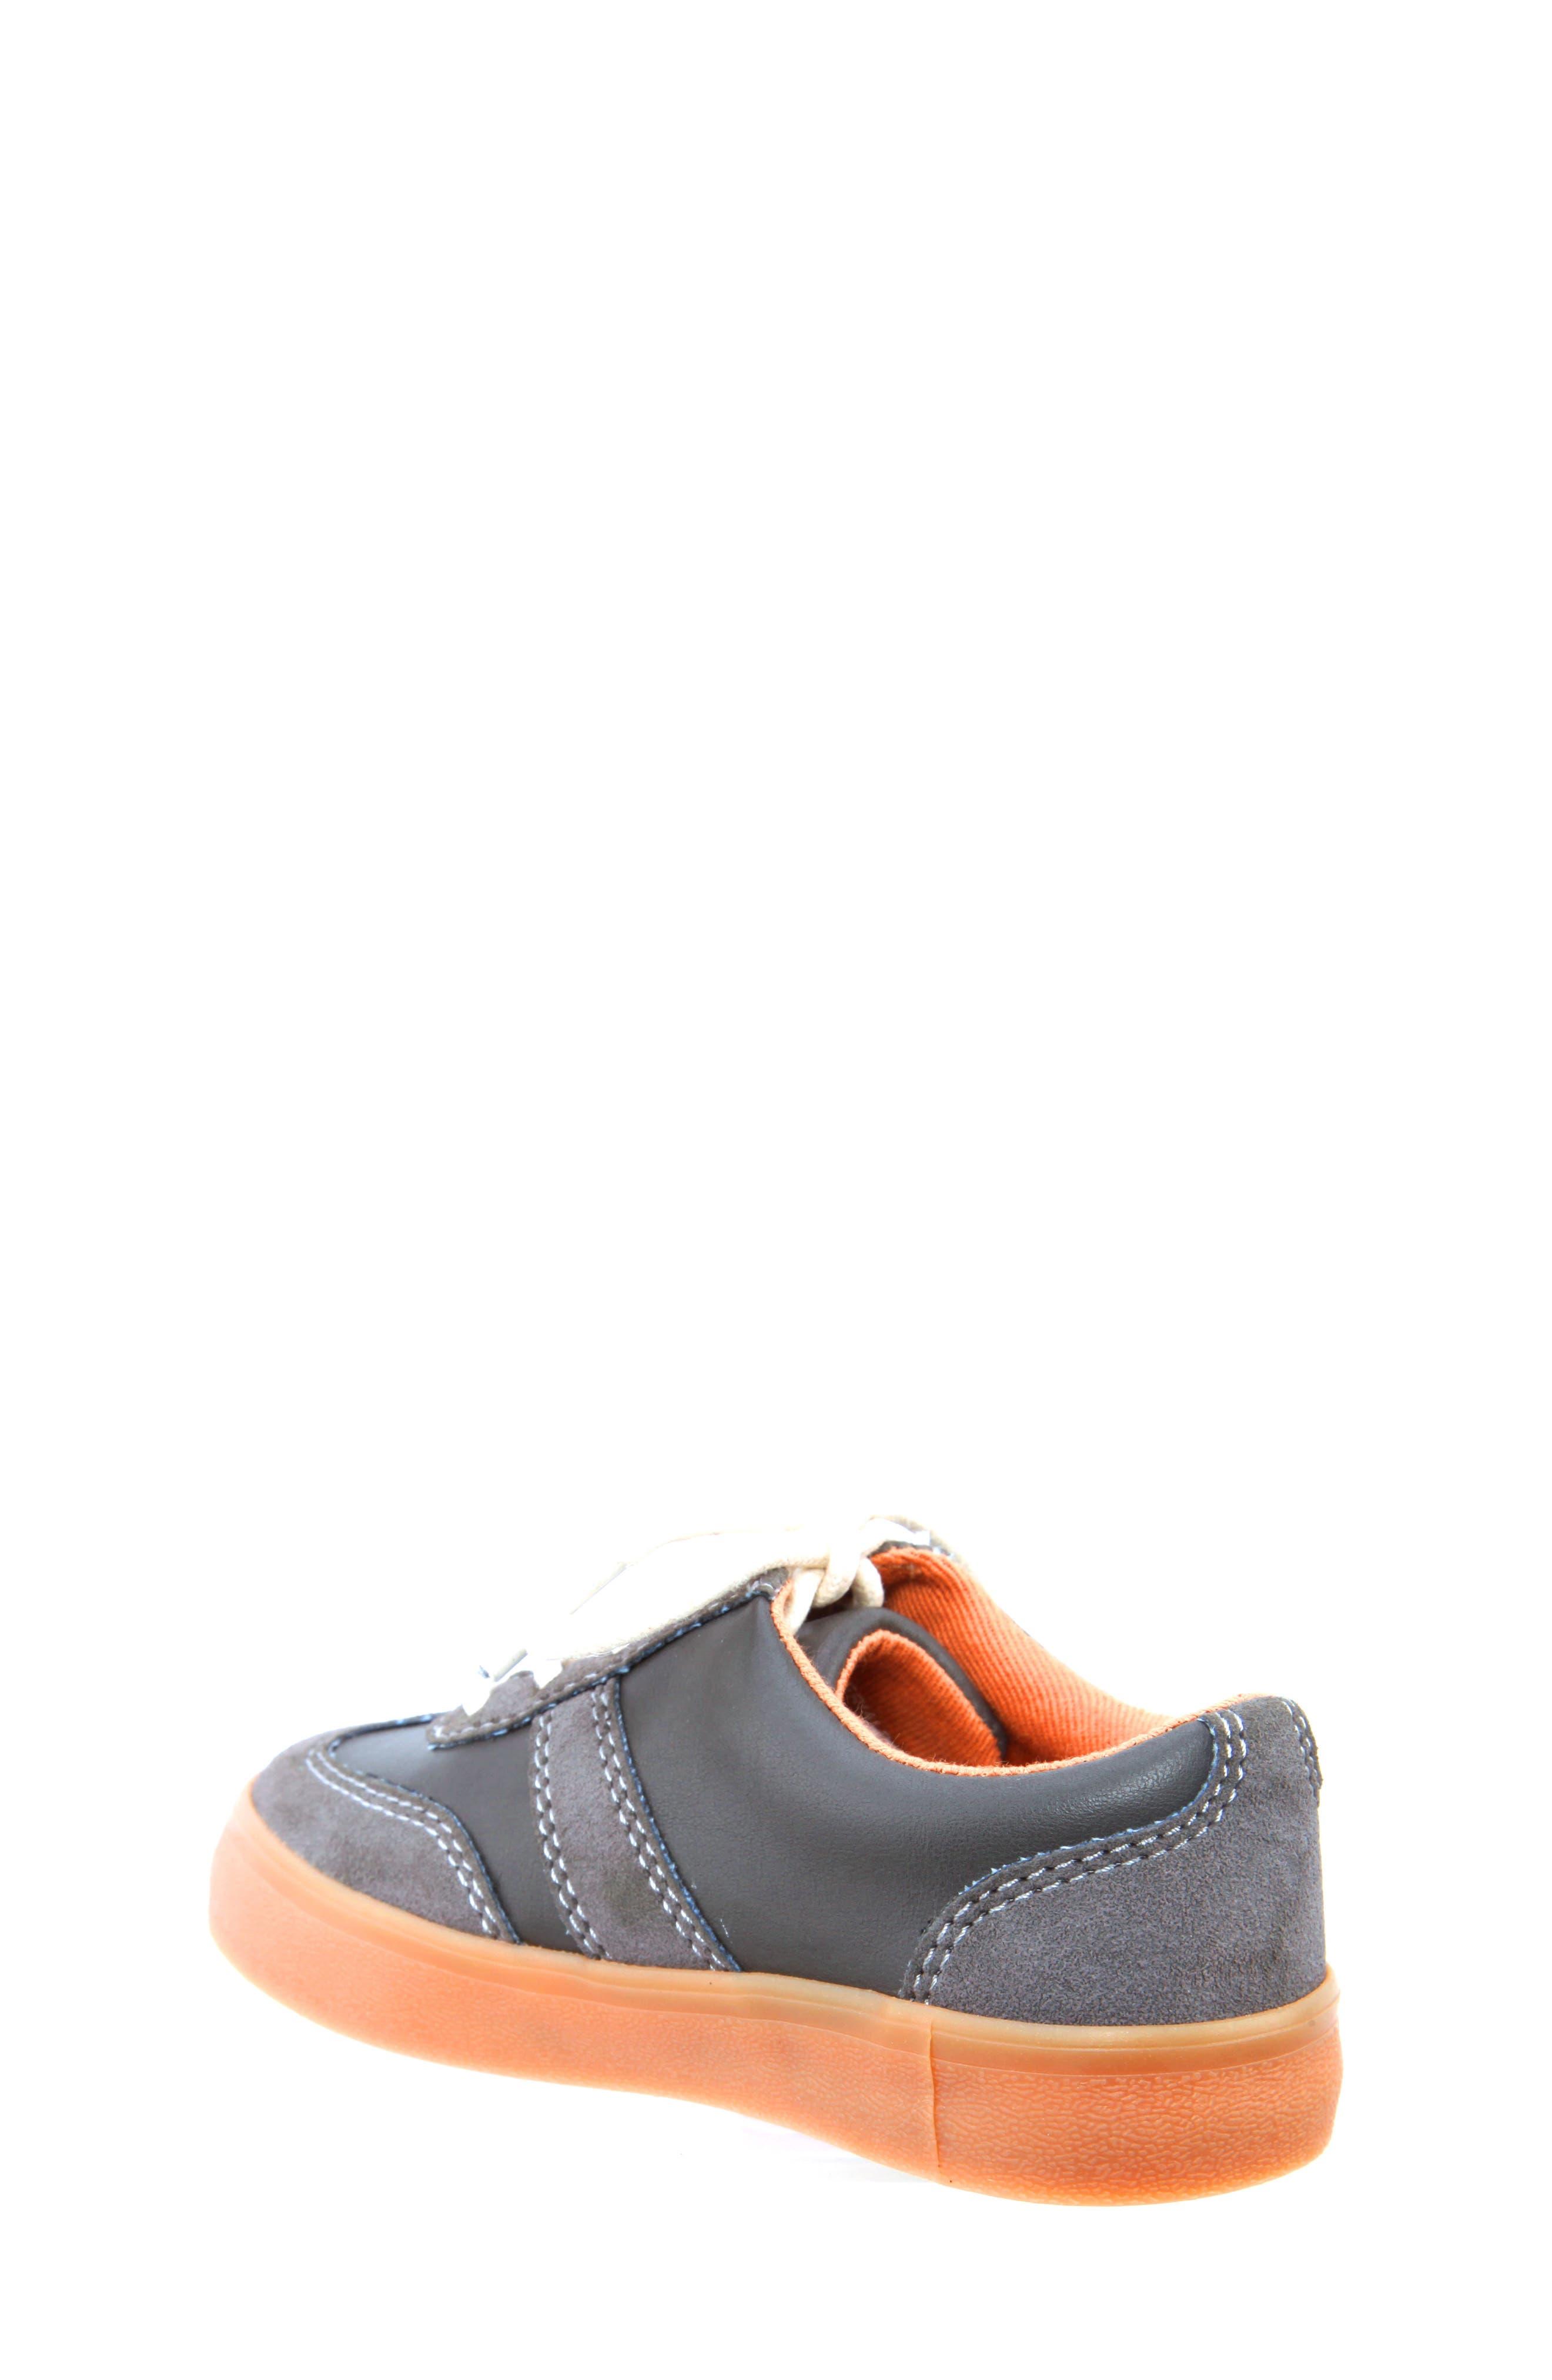 Neal Low Top Sneaker,                             Alternate thumbnail 2, color,                             Grey Suede